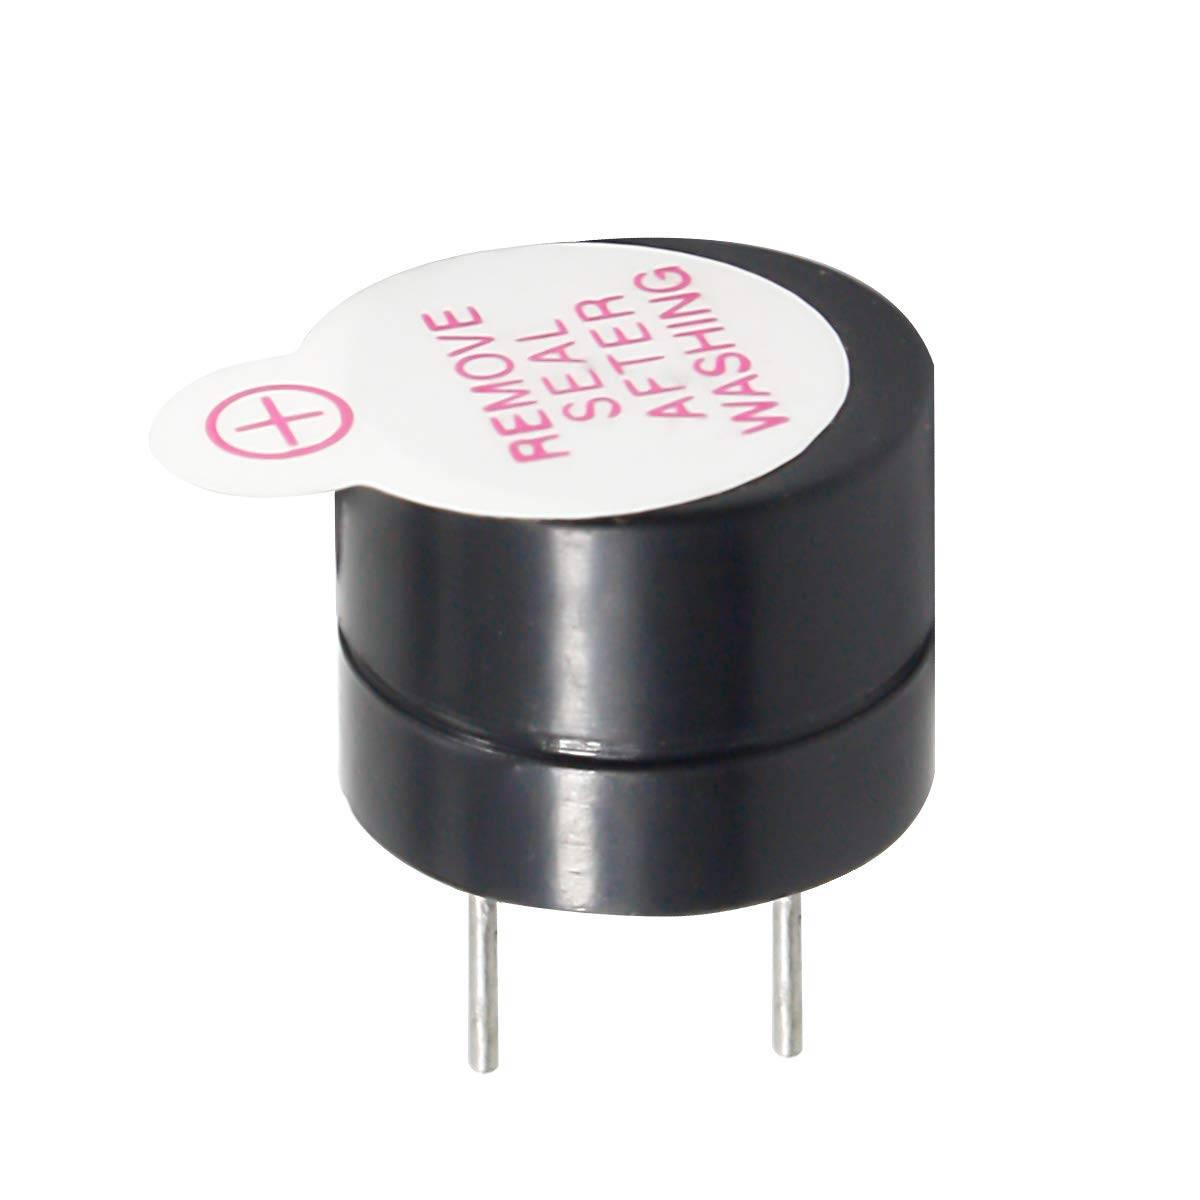 Electromagnetic Buzzer PCB Mount 5V sharvielectronics.com